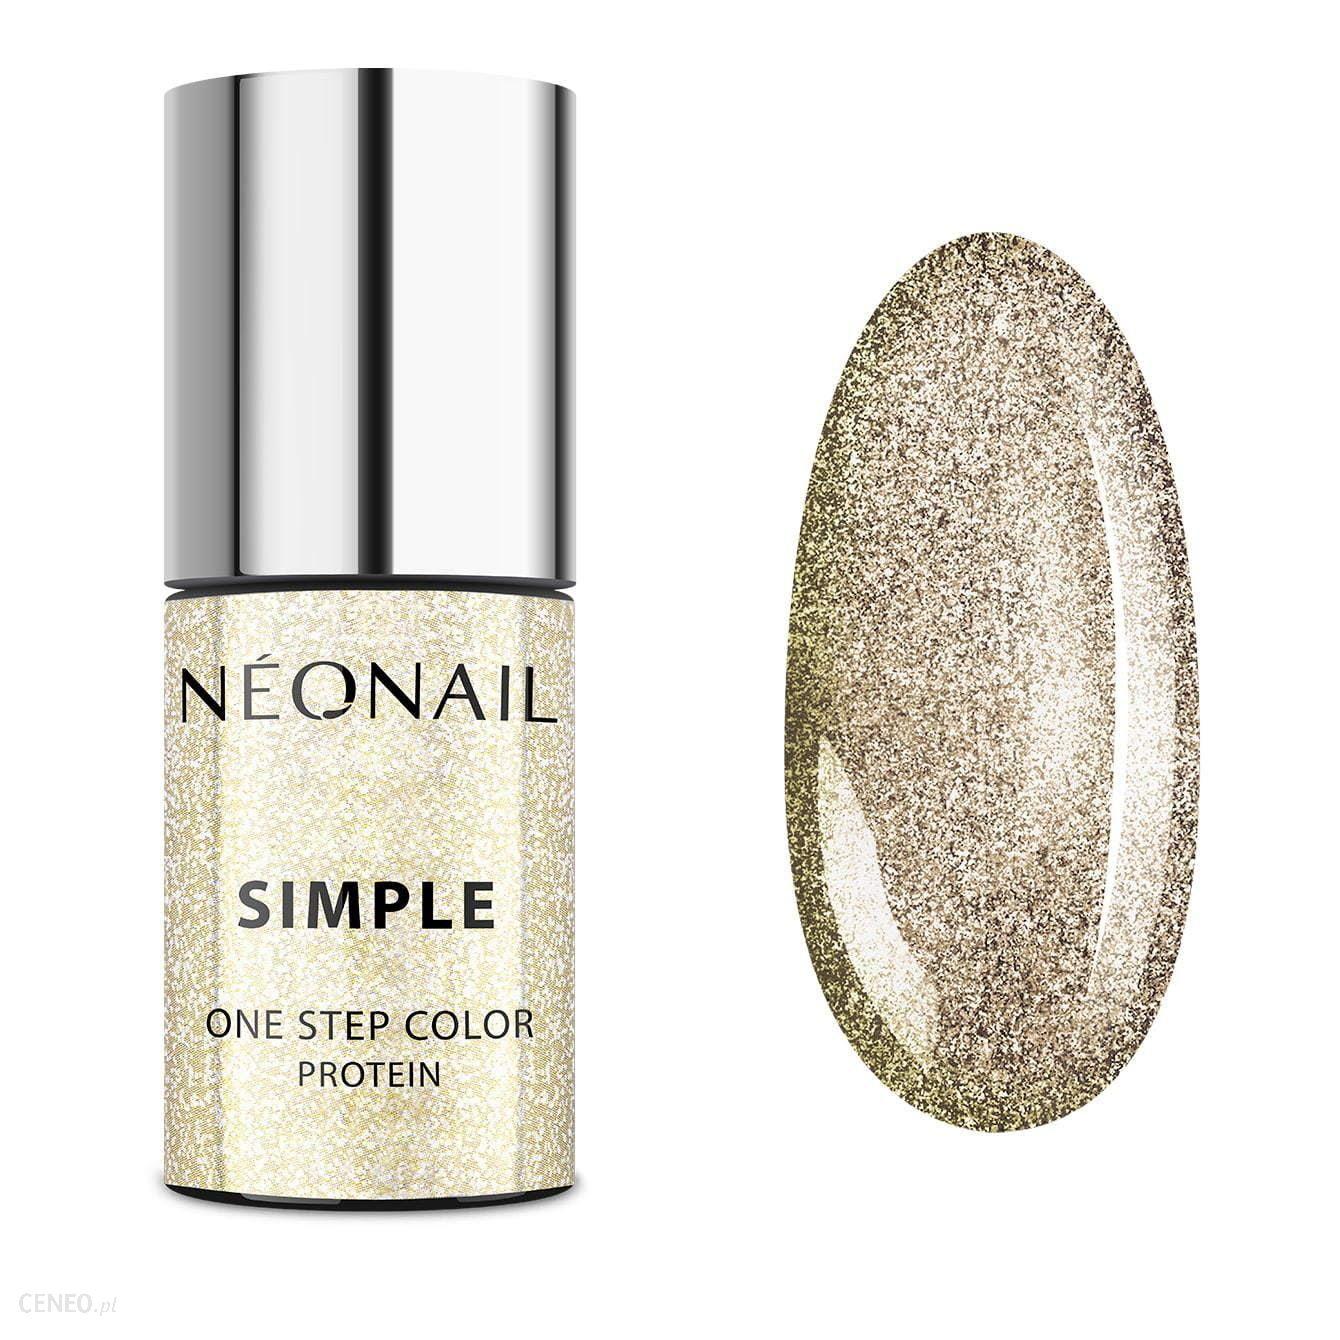 Neonail 3W1 Lakier Hybrydowy Simple Brilliant 7